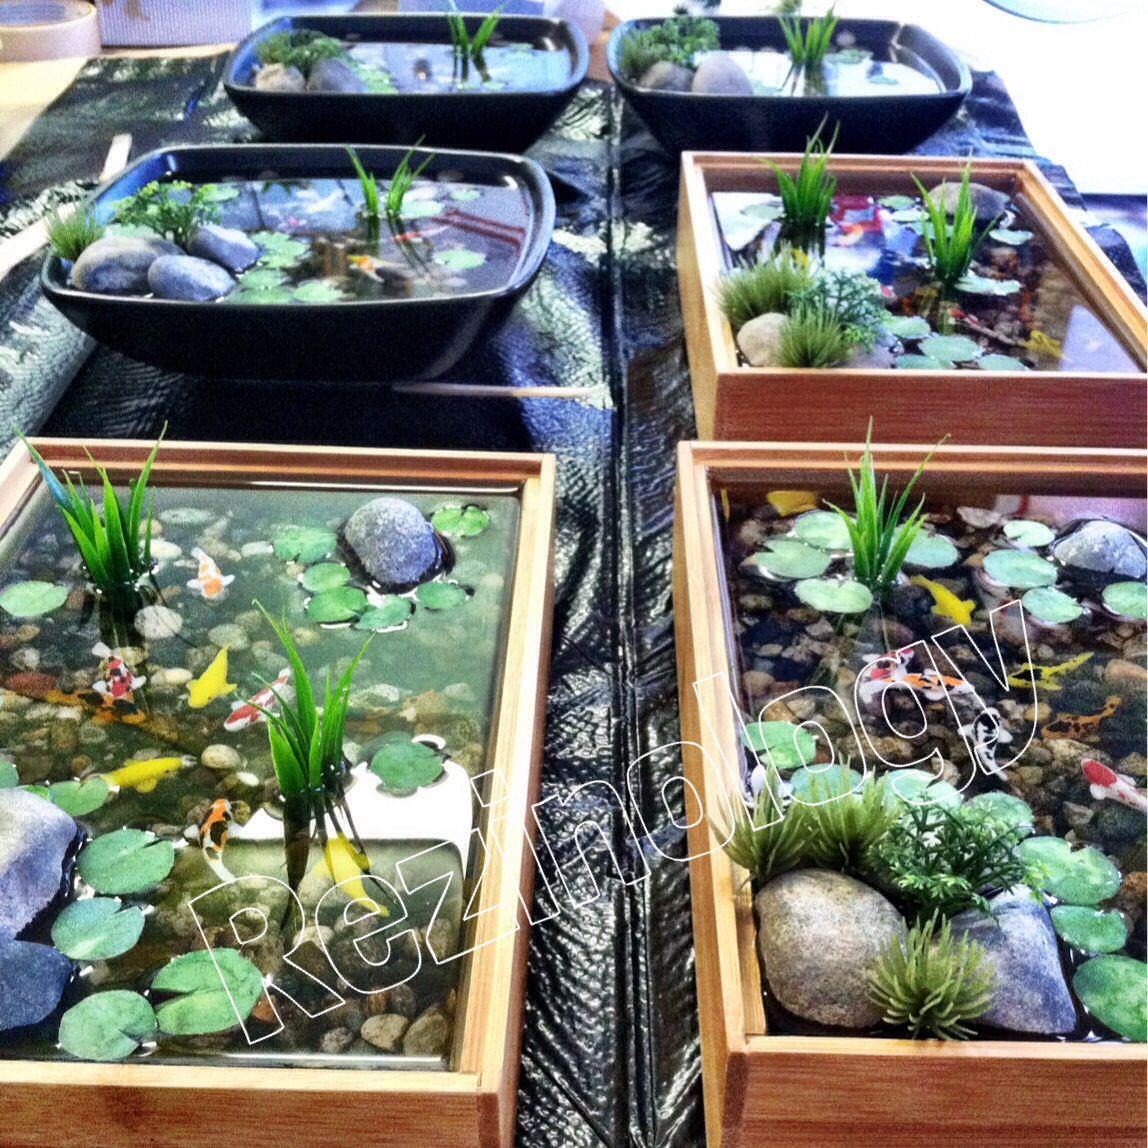 Miniature koi ponds   Miniature koi pond, Aquaponics ...